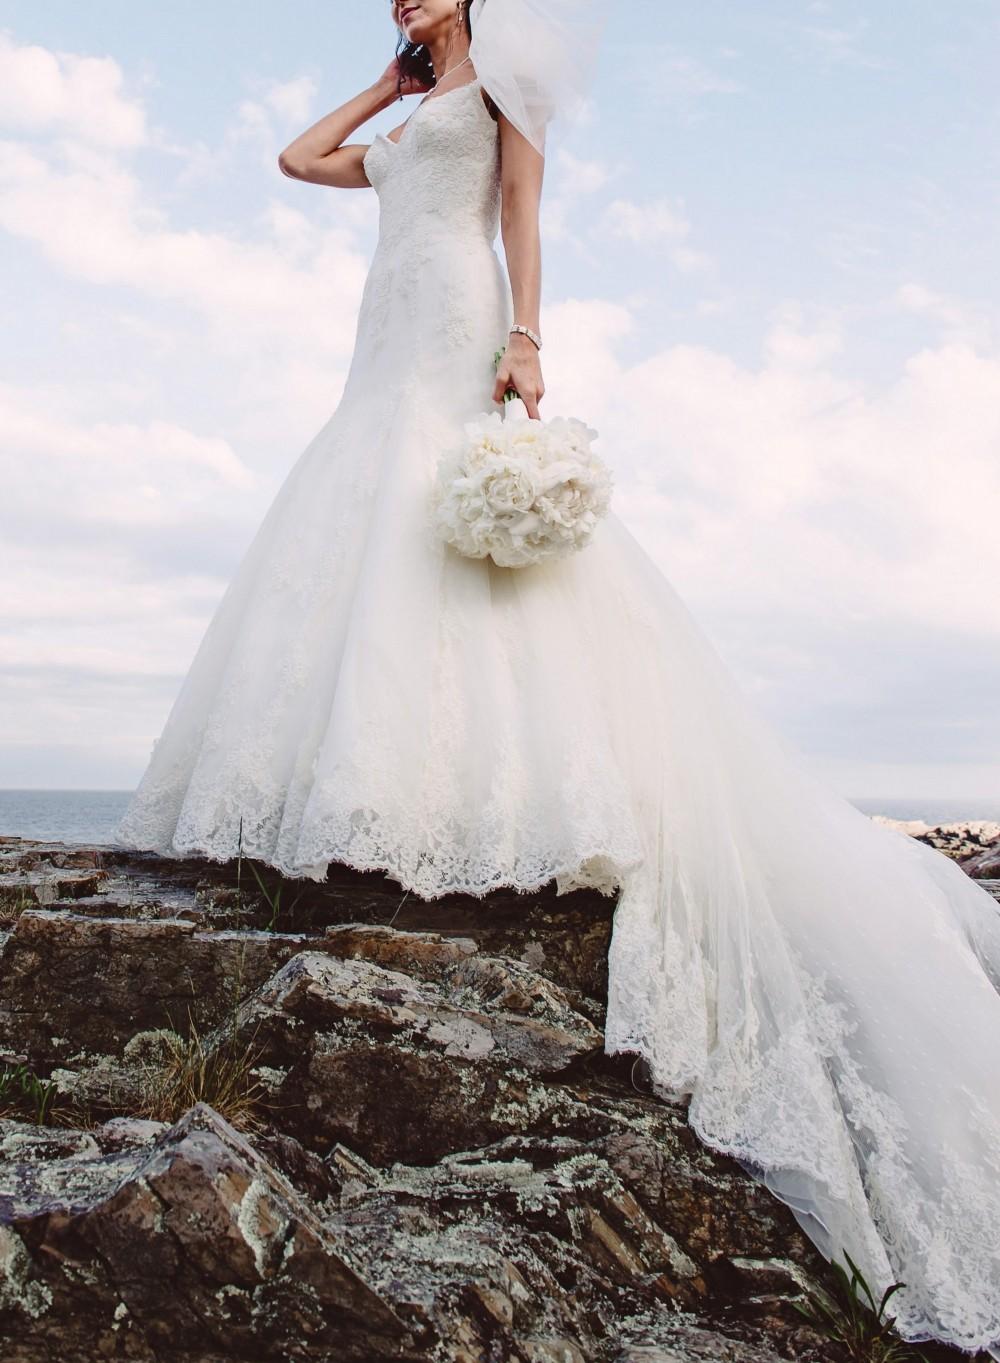 San patrick cobalto second hand wedding dress on sale 48 off for Second hand wedding dresses san diego